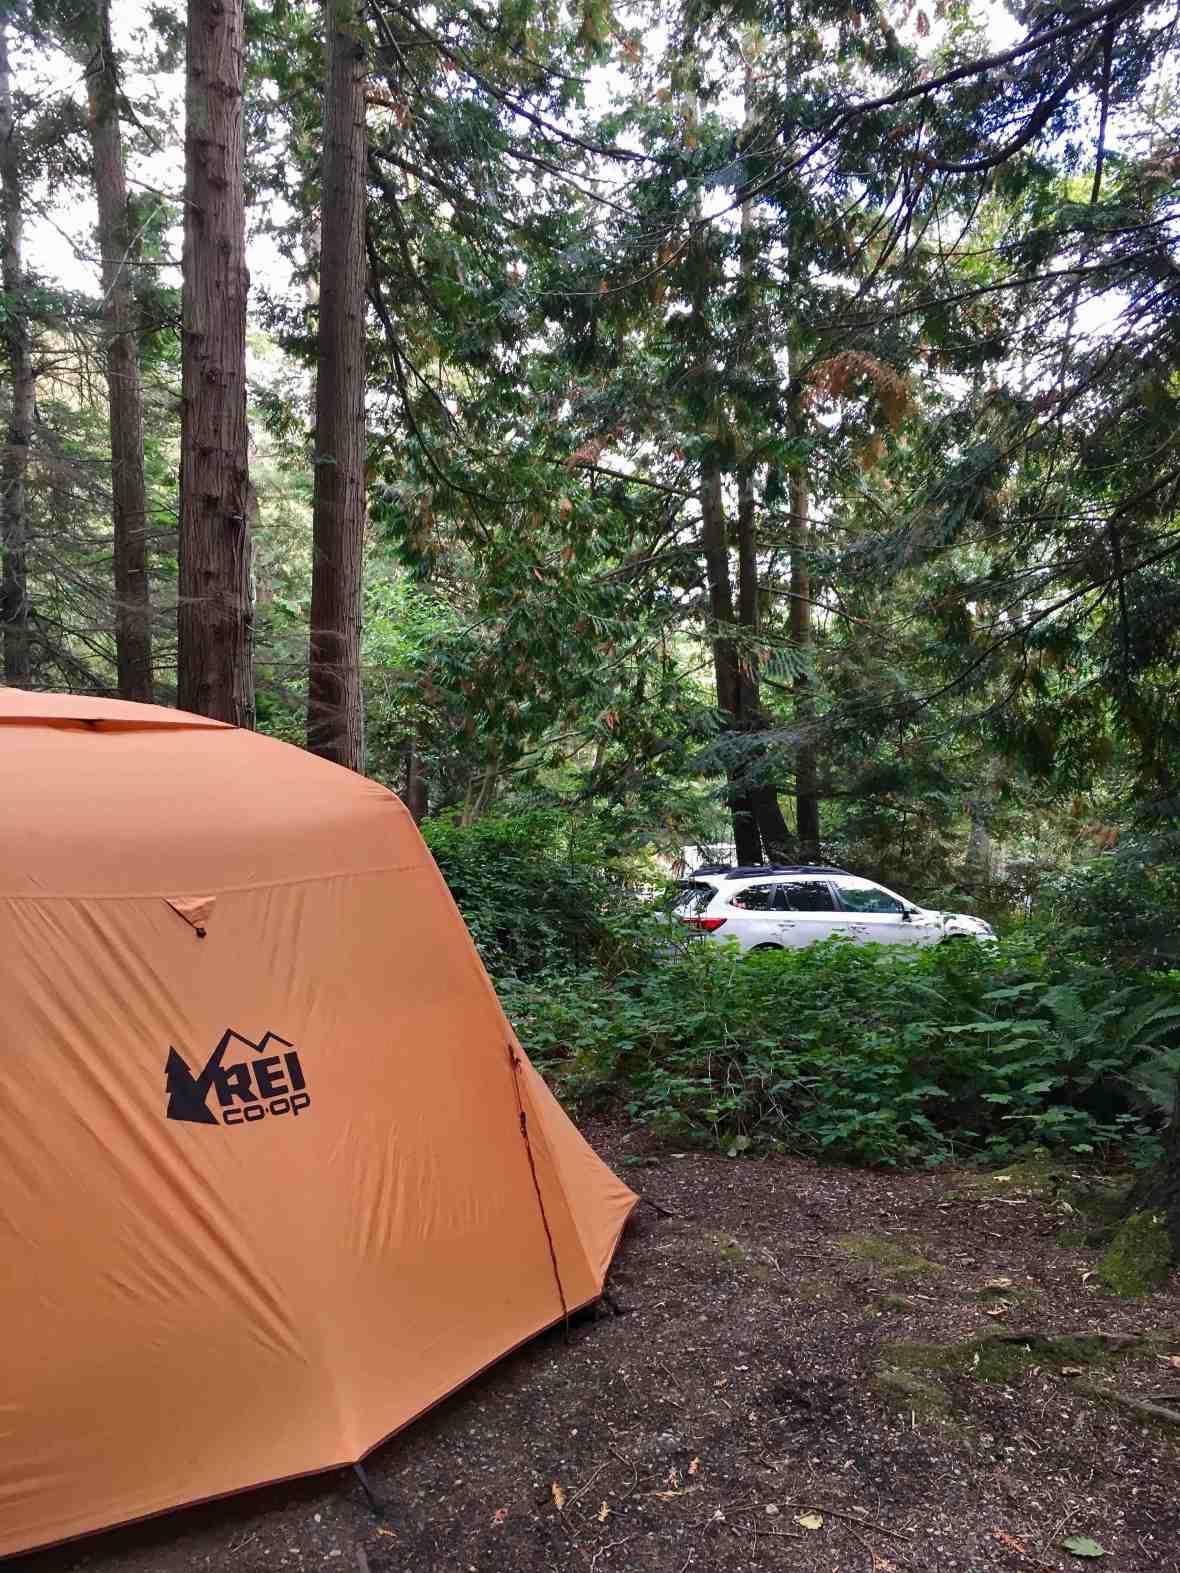 REI Grand Hut 4 Tent at Larrabee State Park, Washington